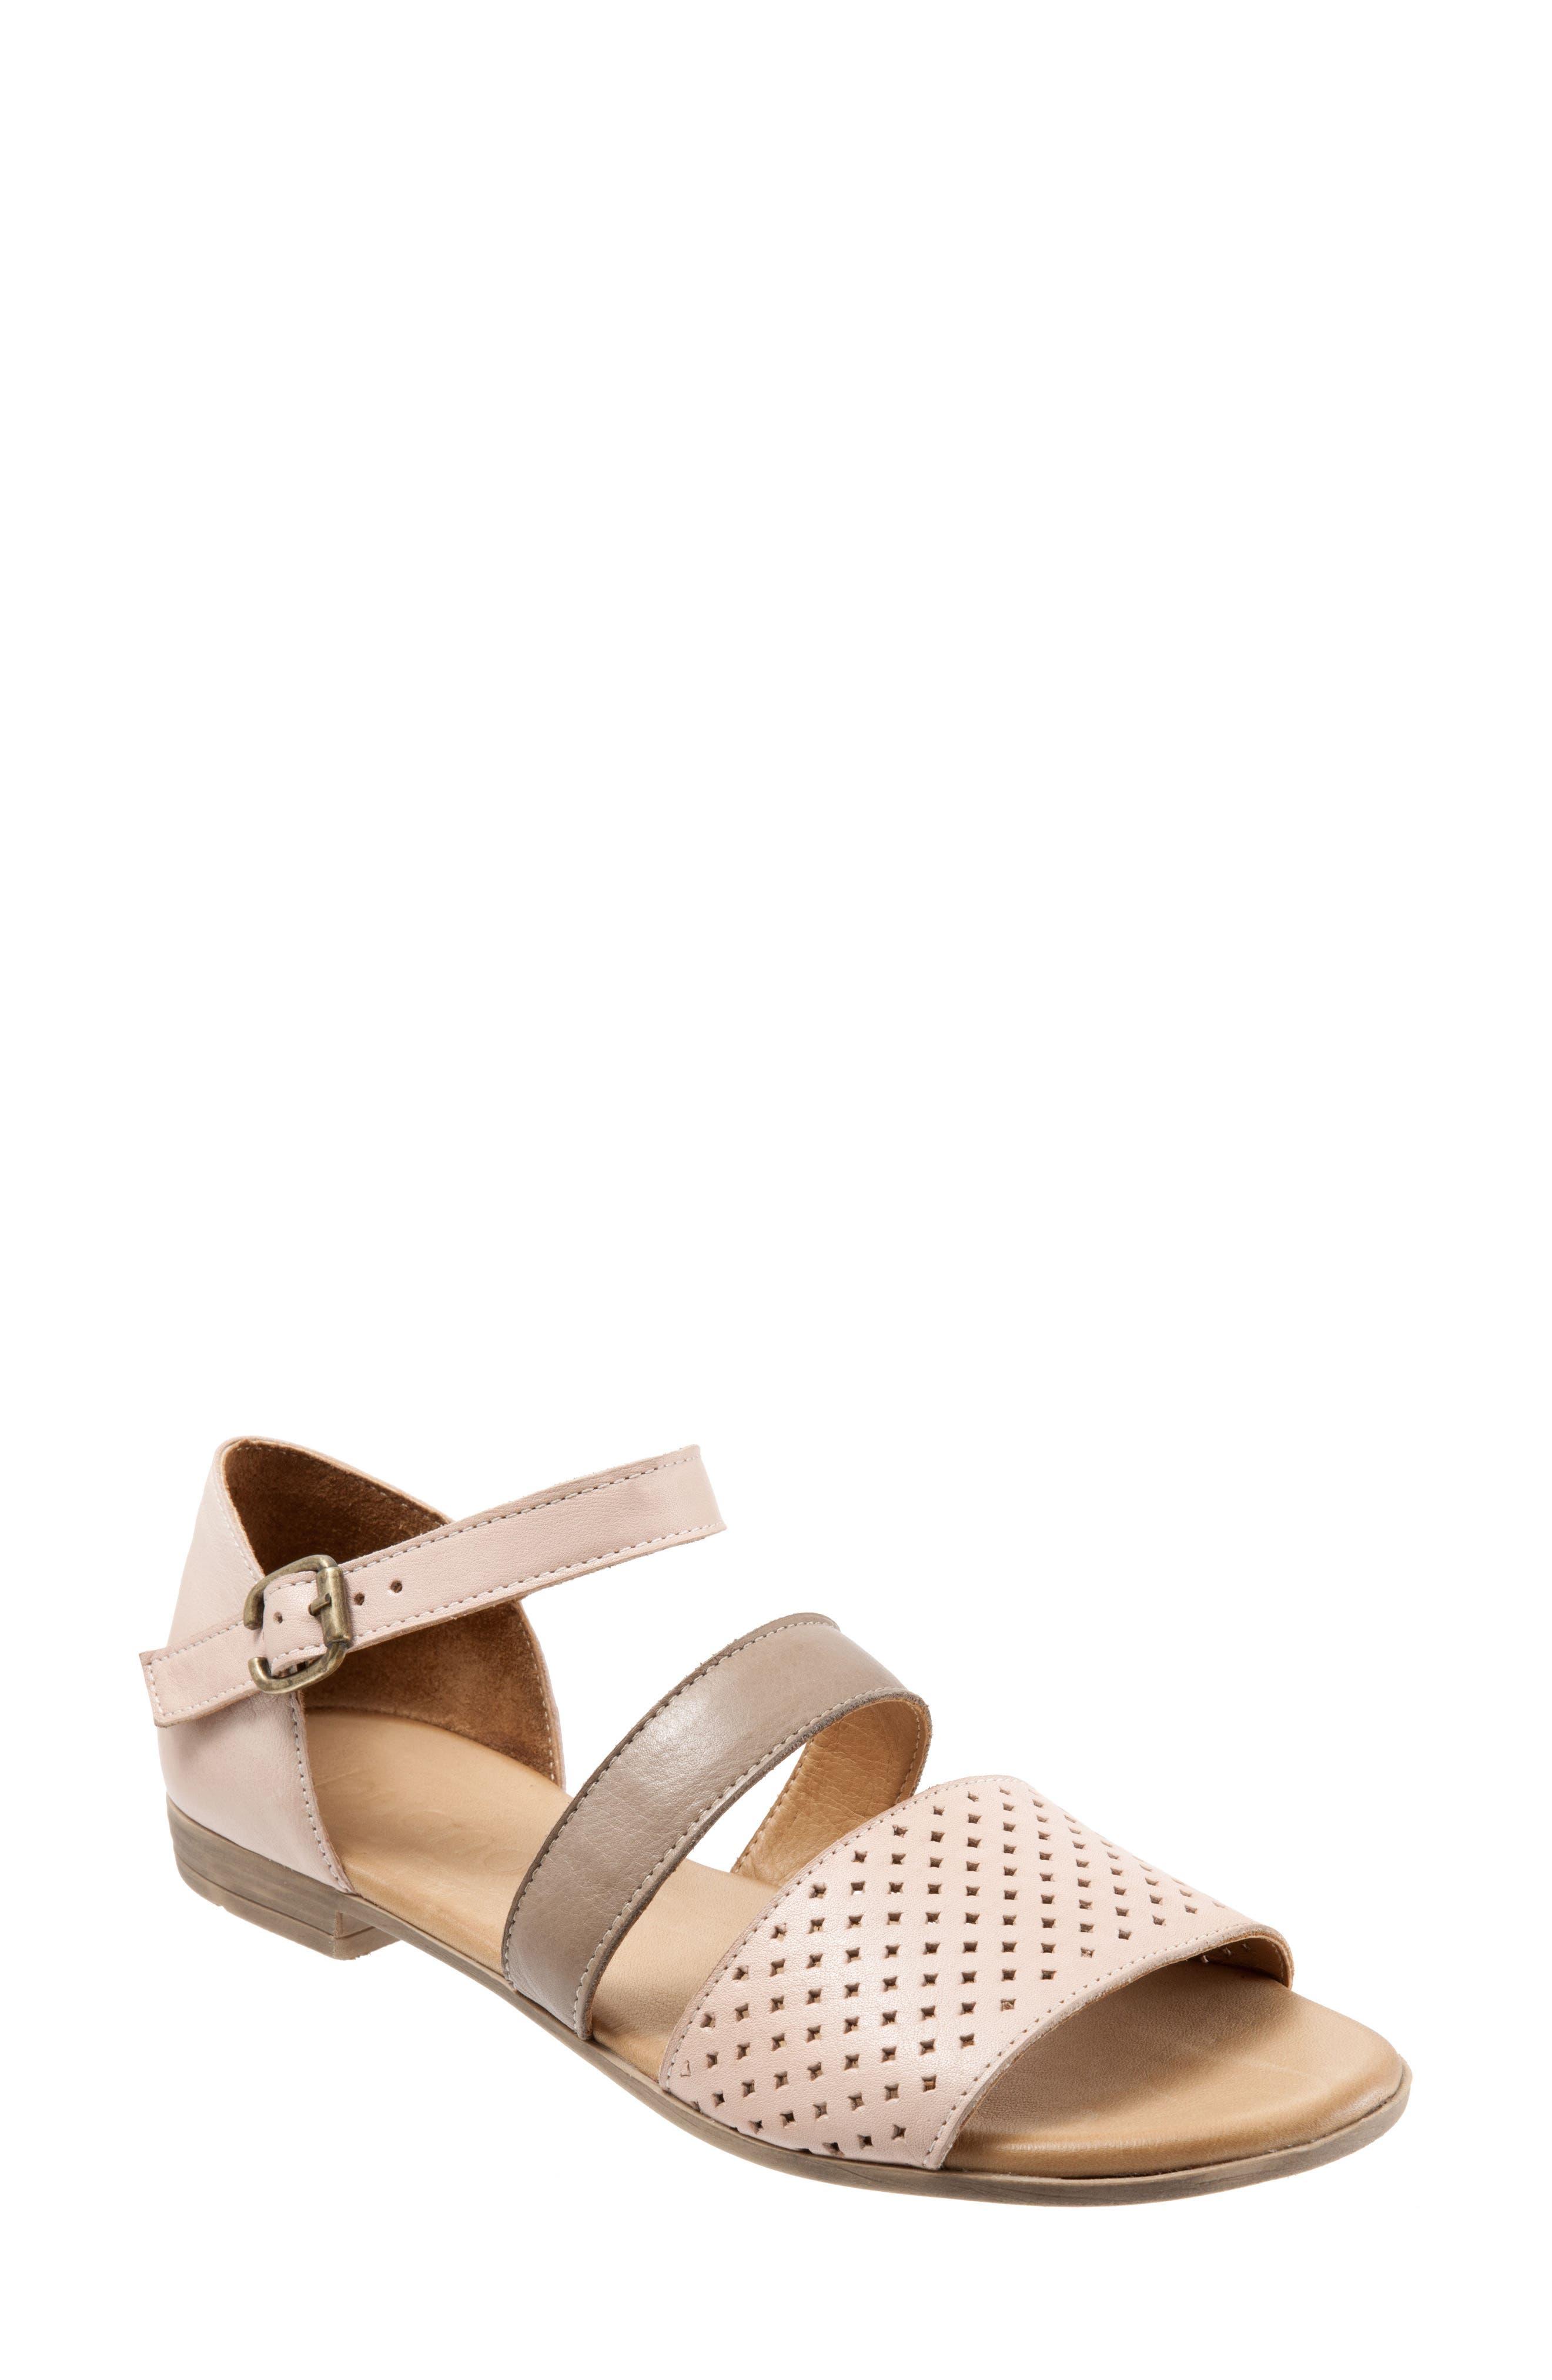 Bueno Janet Perforated Flat Sandal - Pink